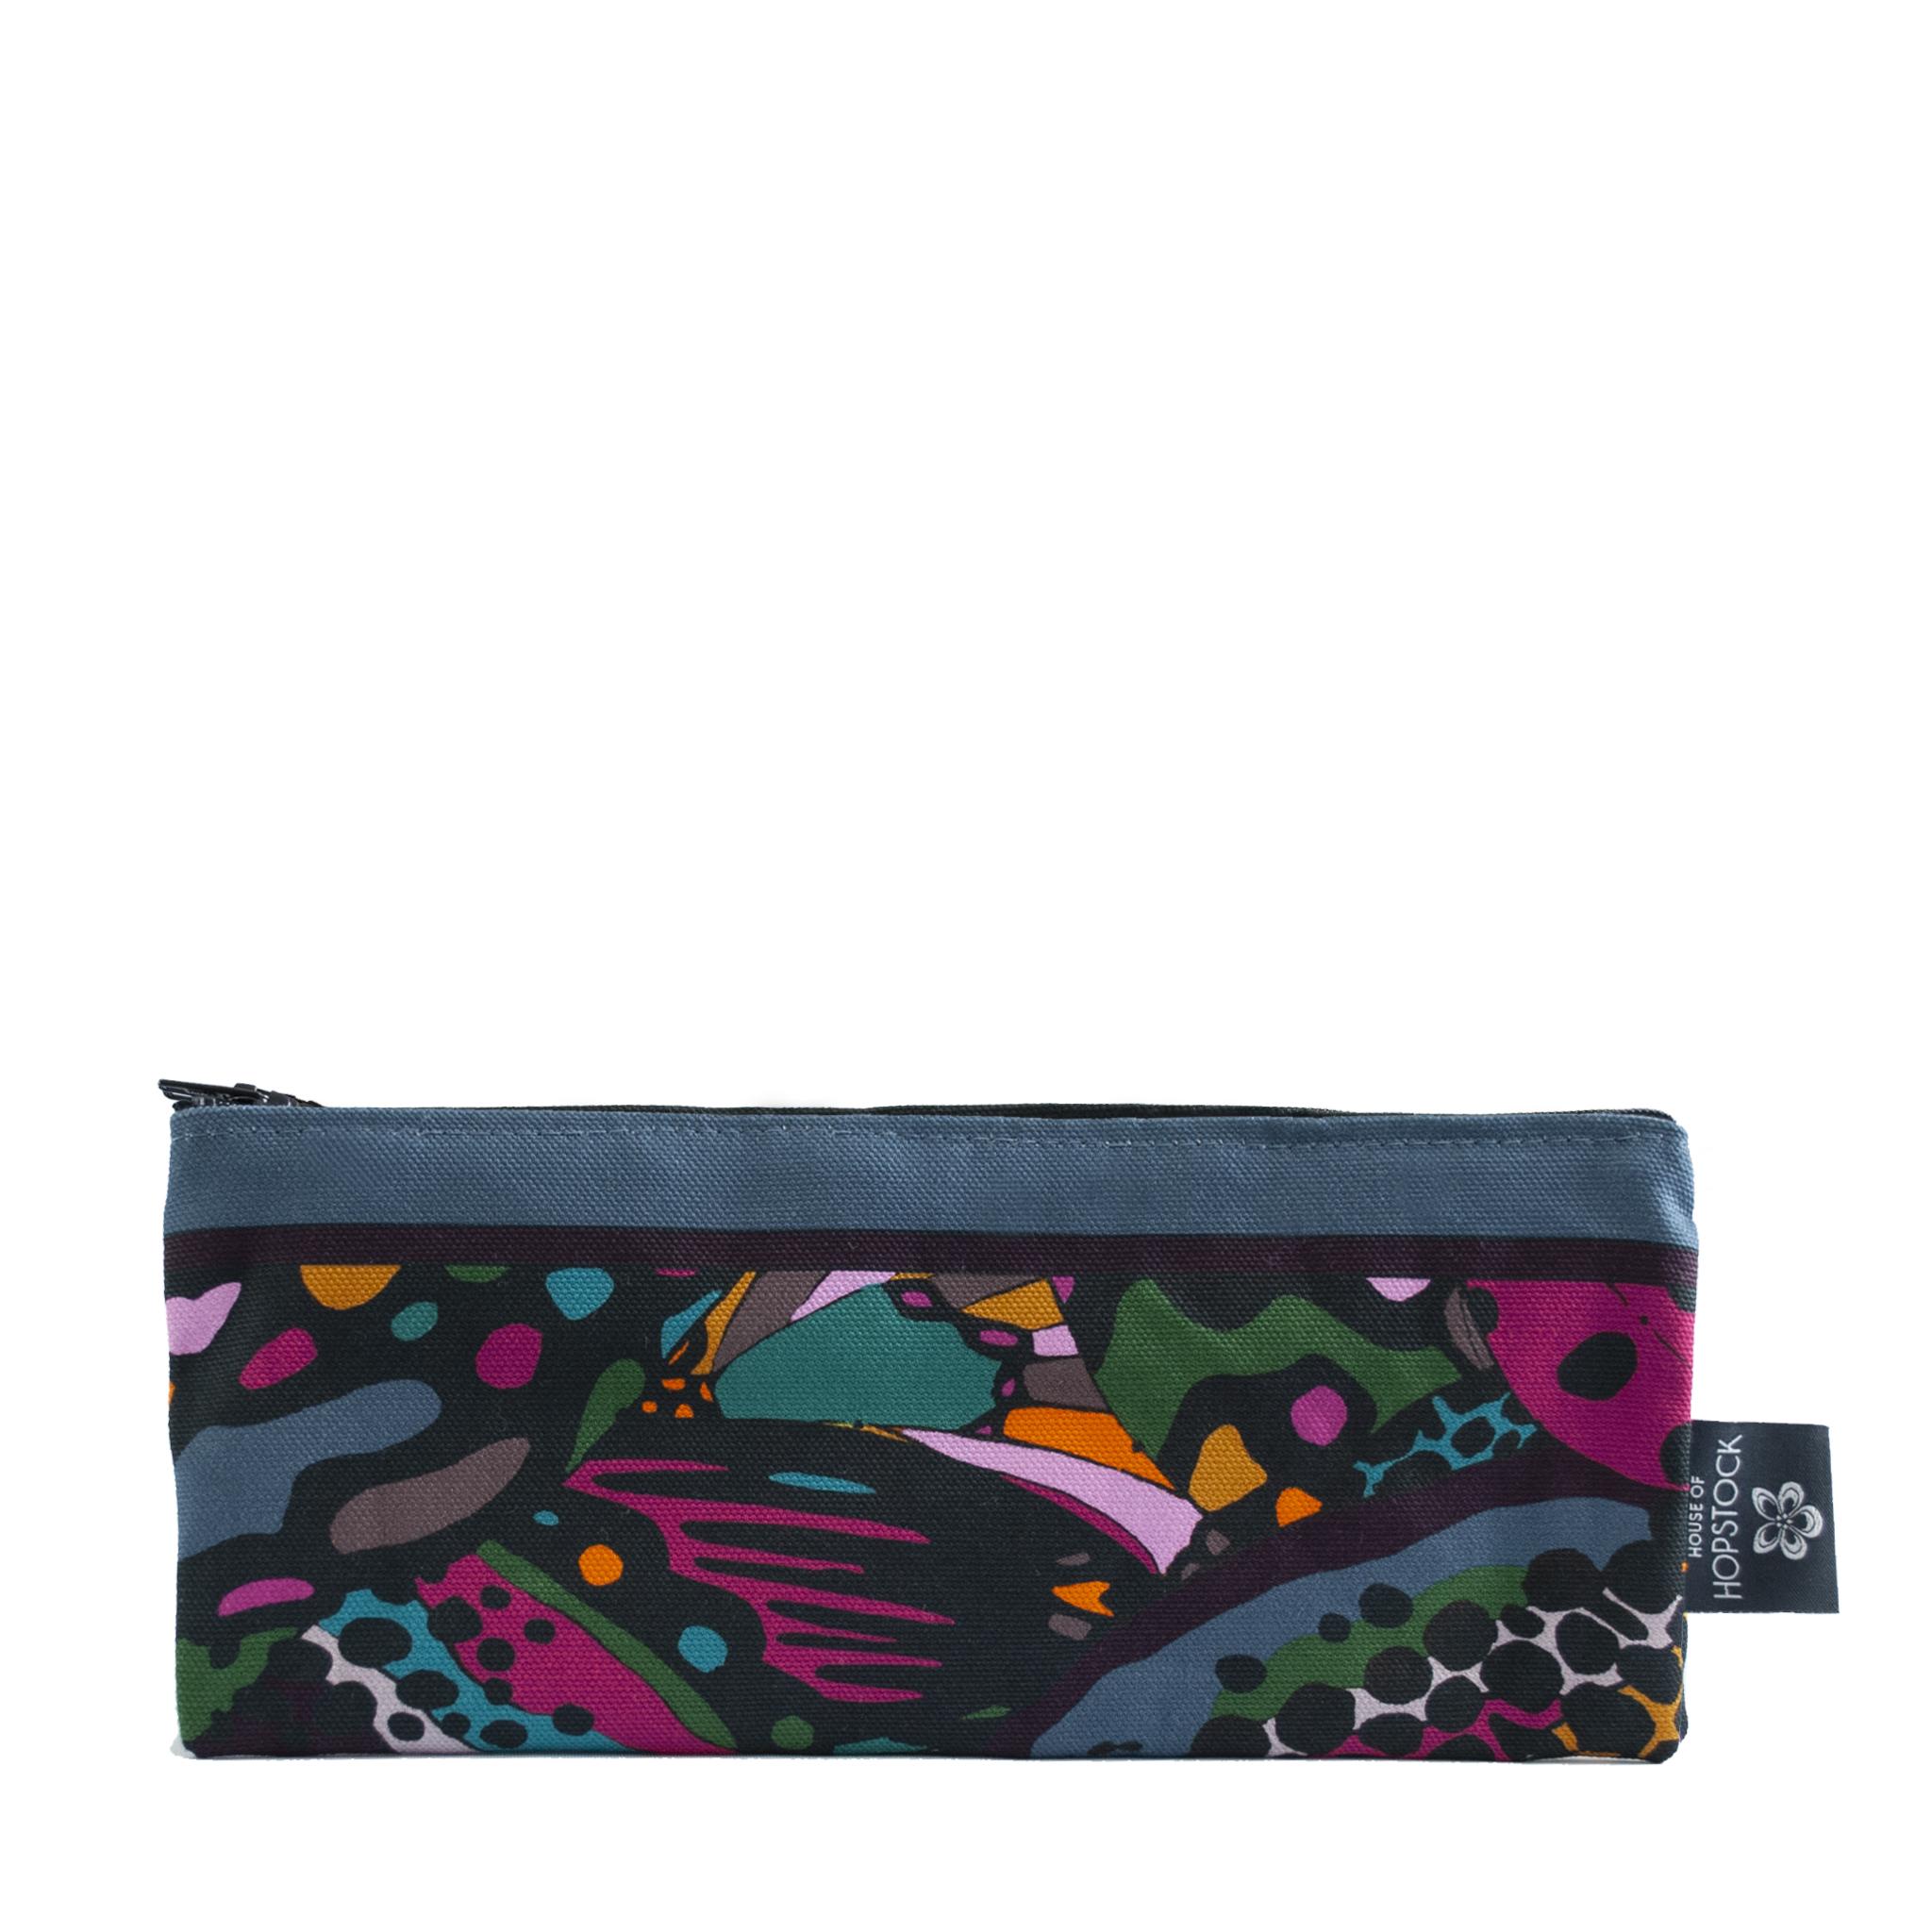 abstract art print brush bag makeup bag cosmetics bag house of hopstock collidoskope